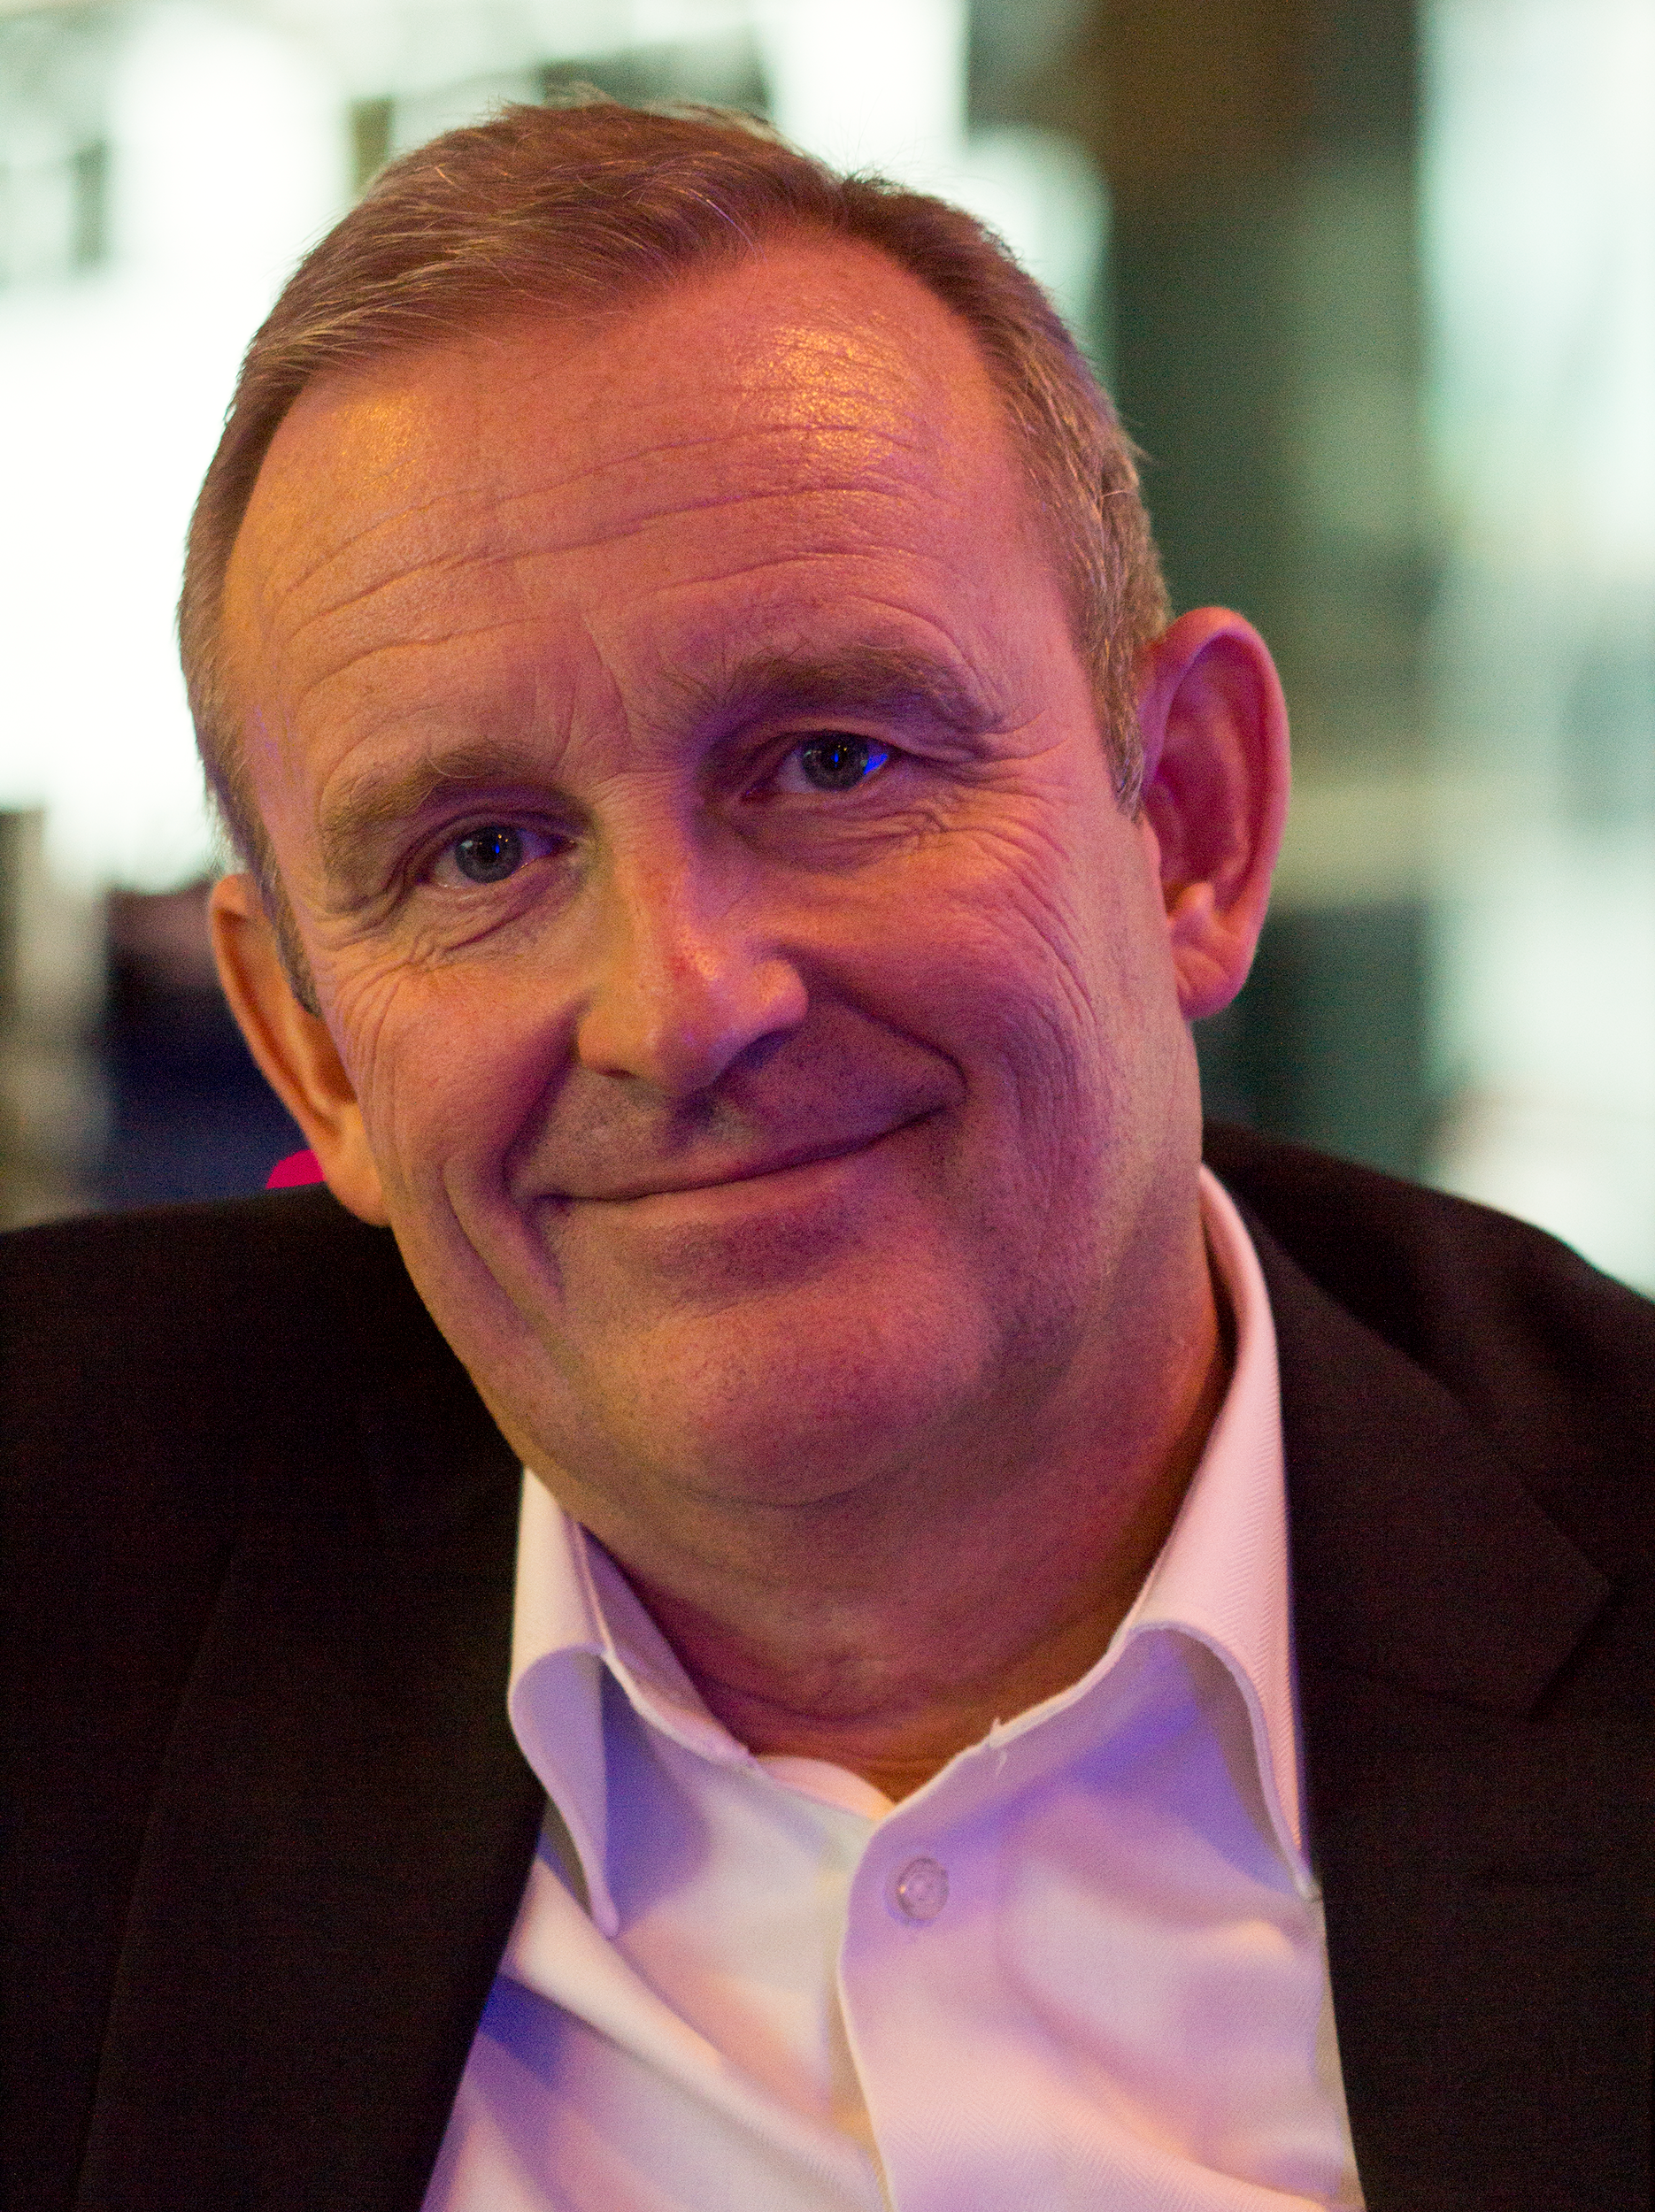 Ole Vinje, konsernsjef i Komplett Group. Foto: Jørgen Elton Nilsen, Hardware.no